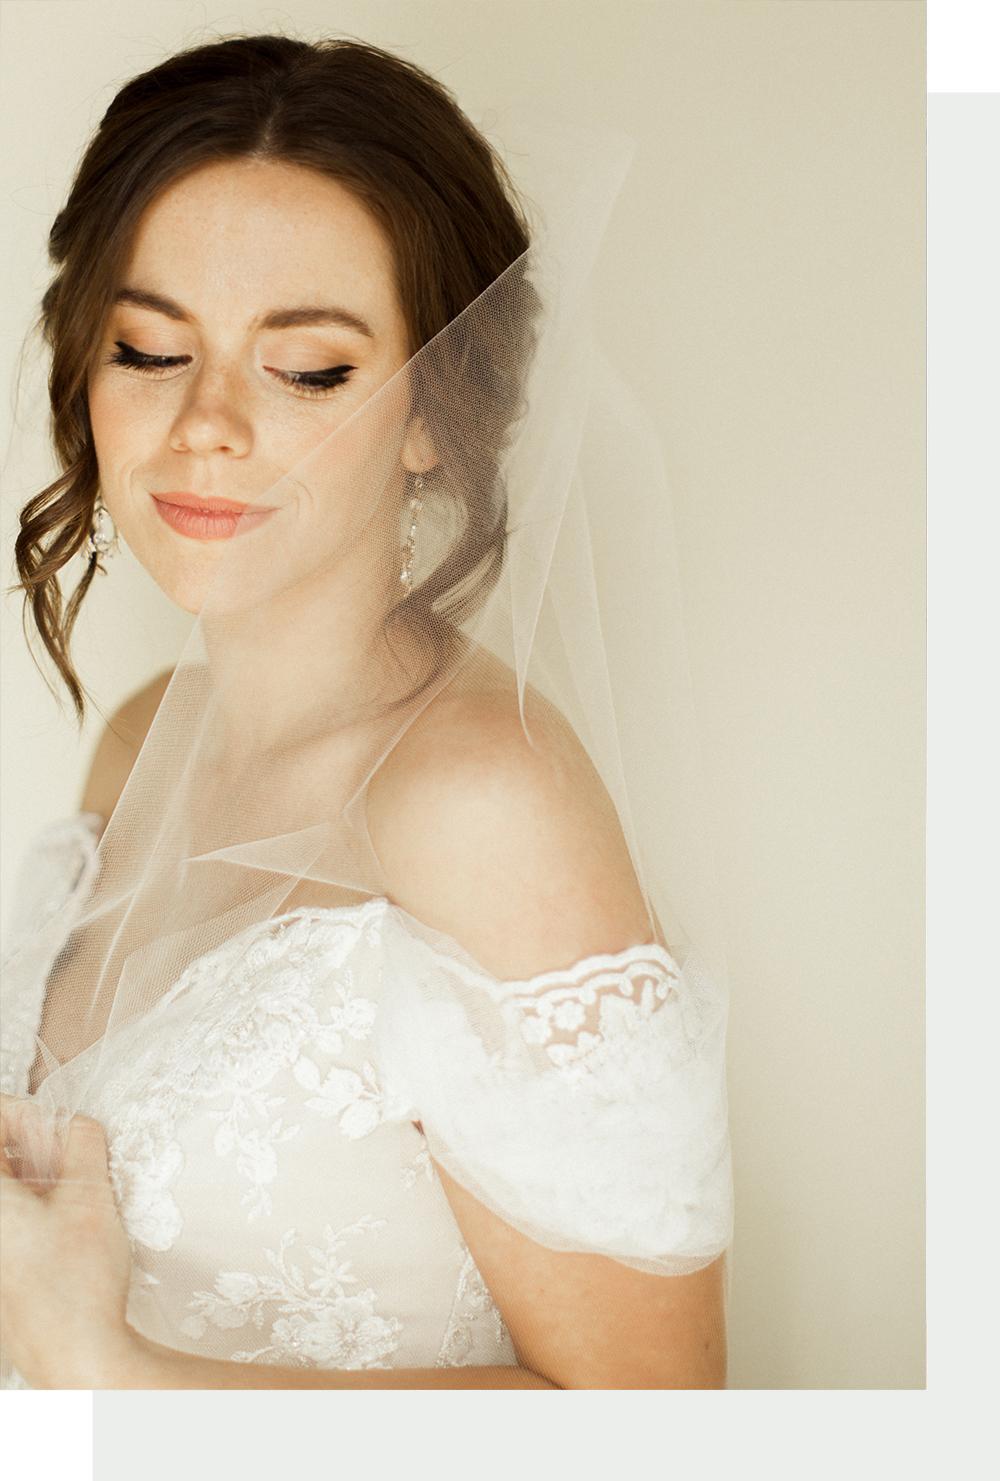 KO_Contact_Brides_Contact_Wedding_brynnjpg.jpg